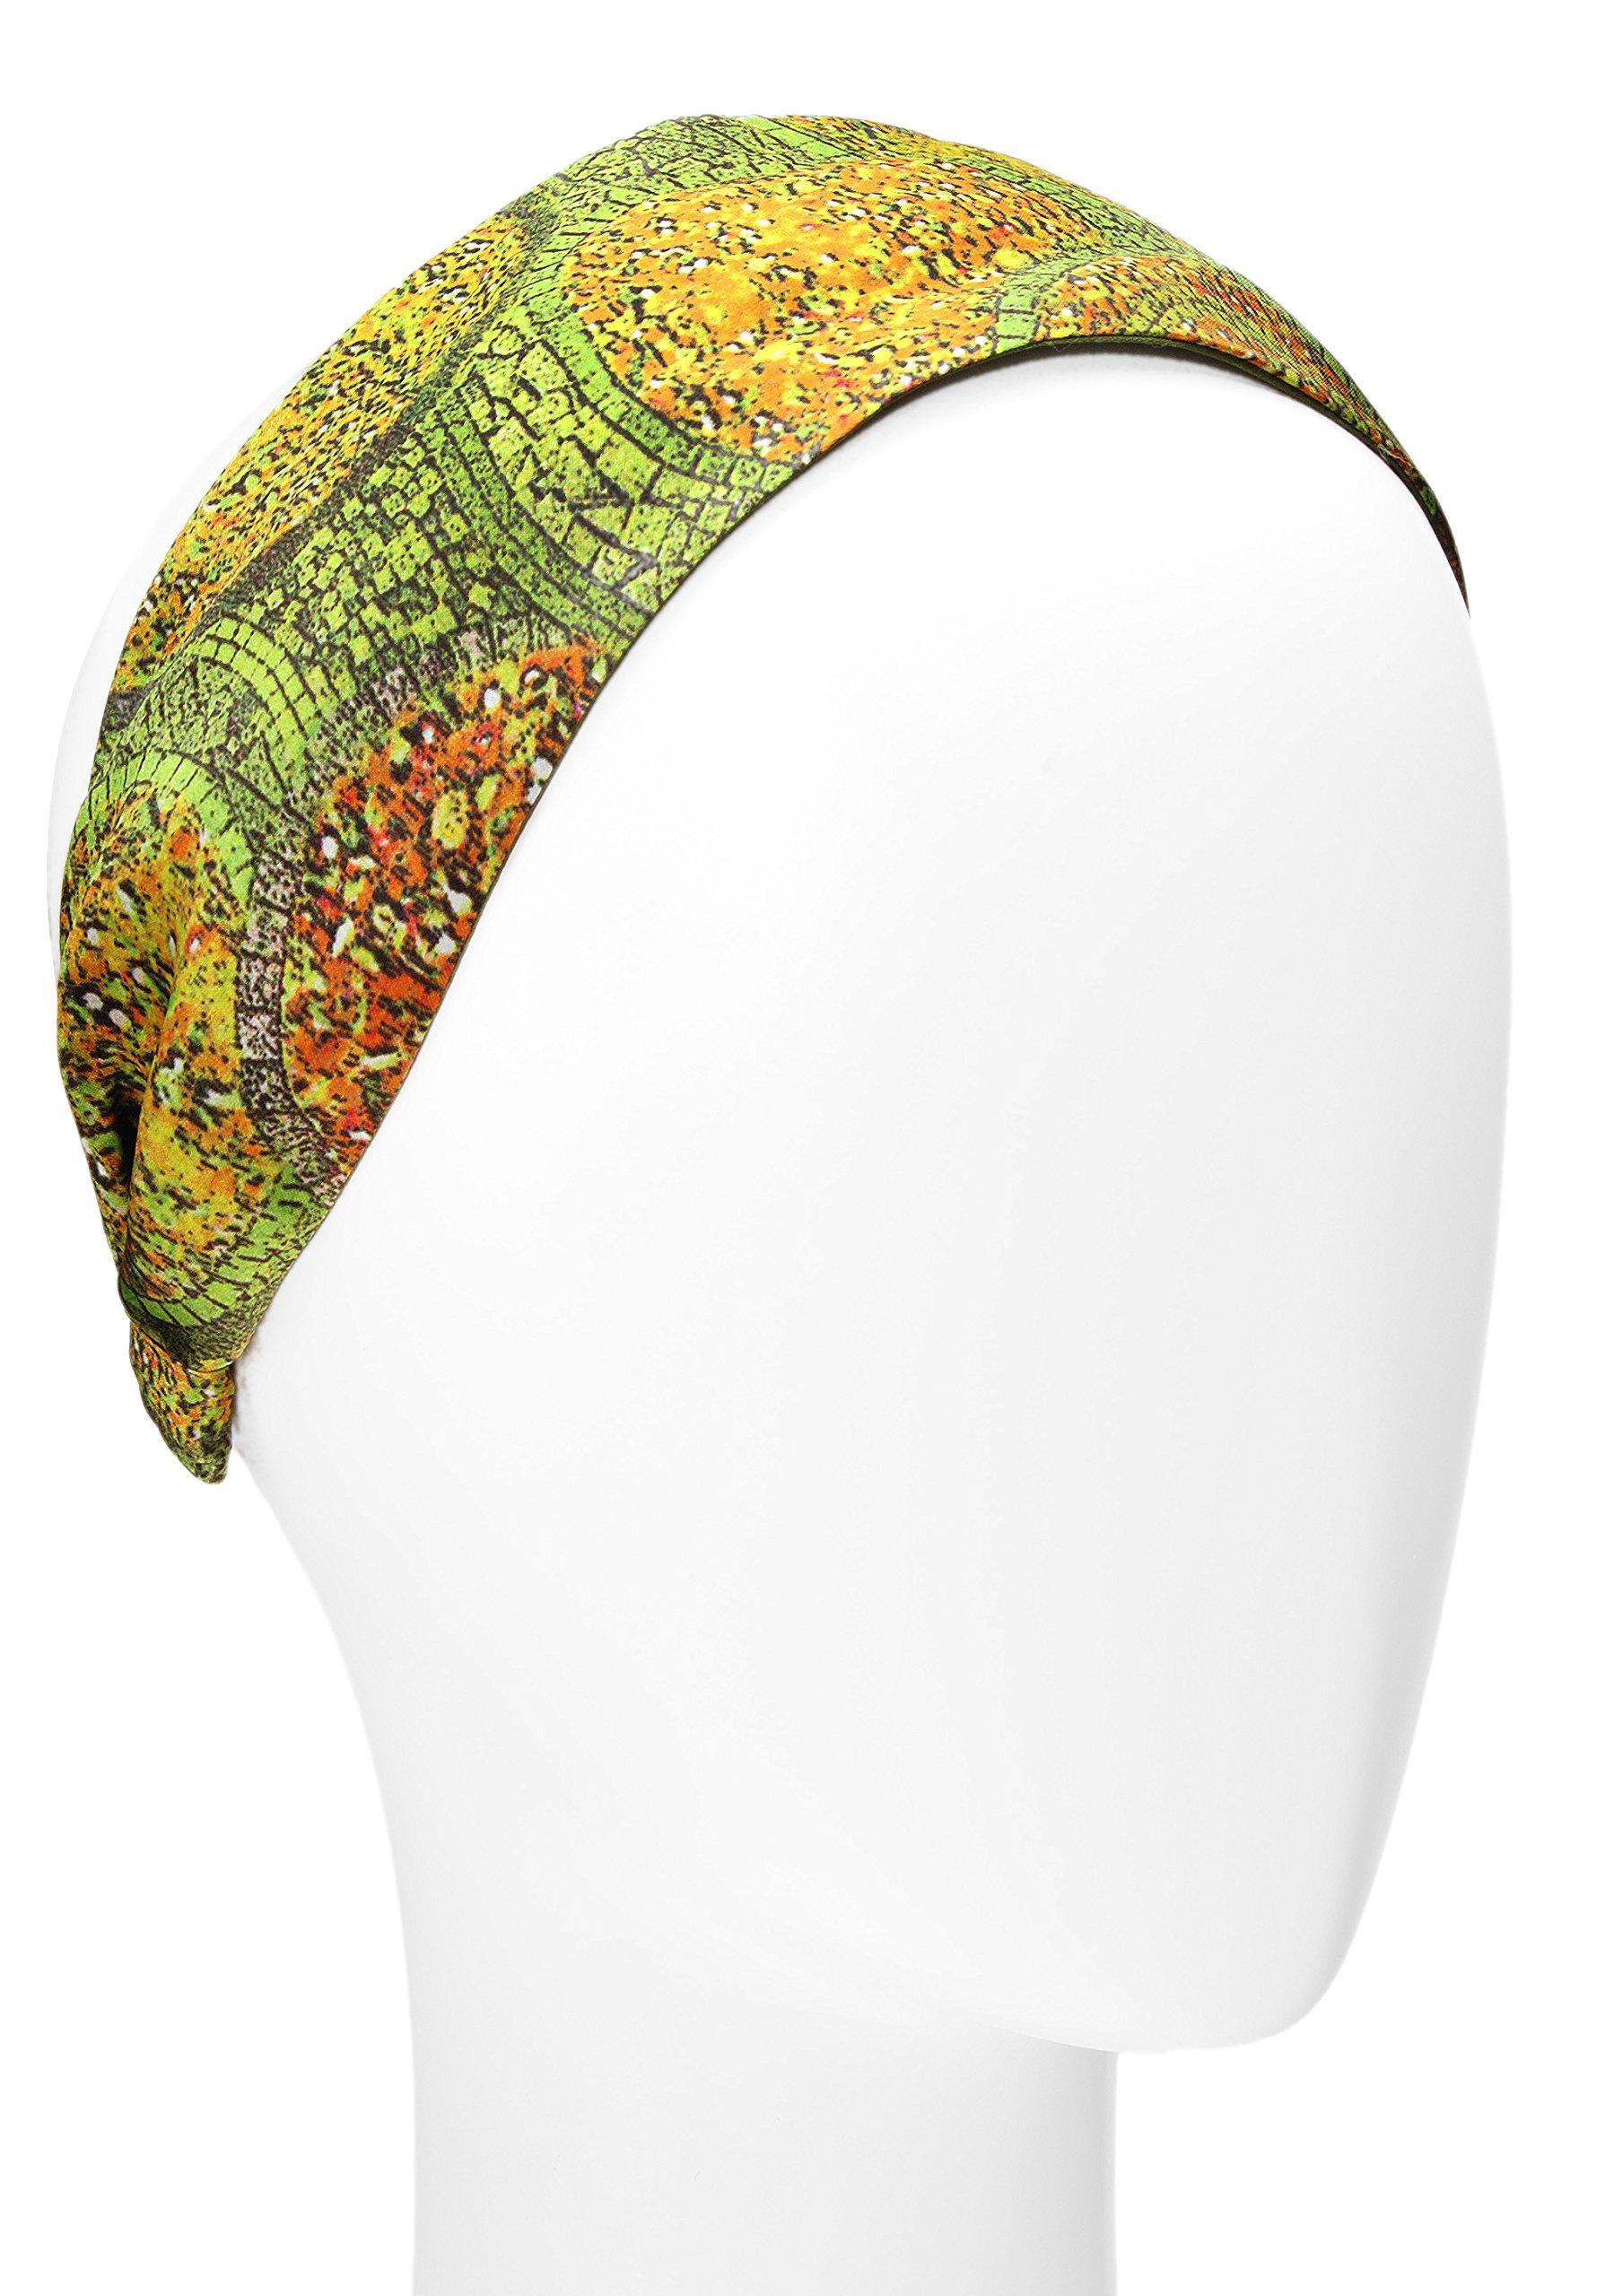 L. Erickson USA Scarf Headband - Yellow Multi